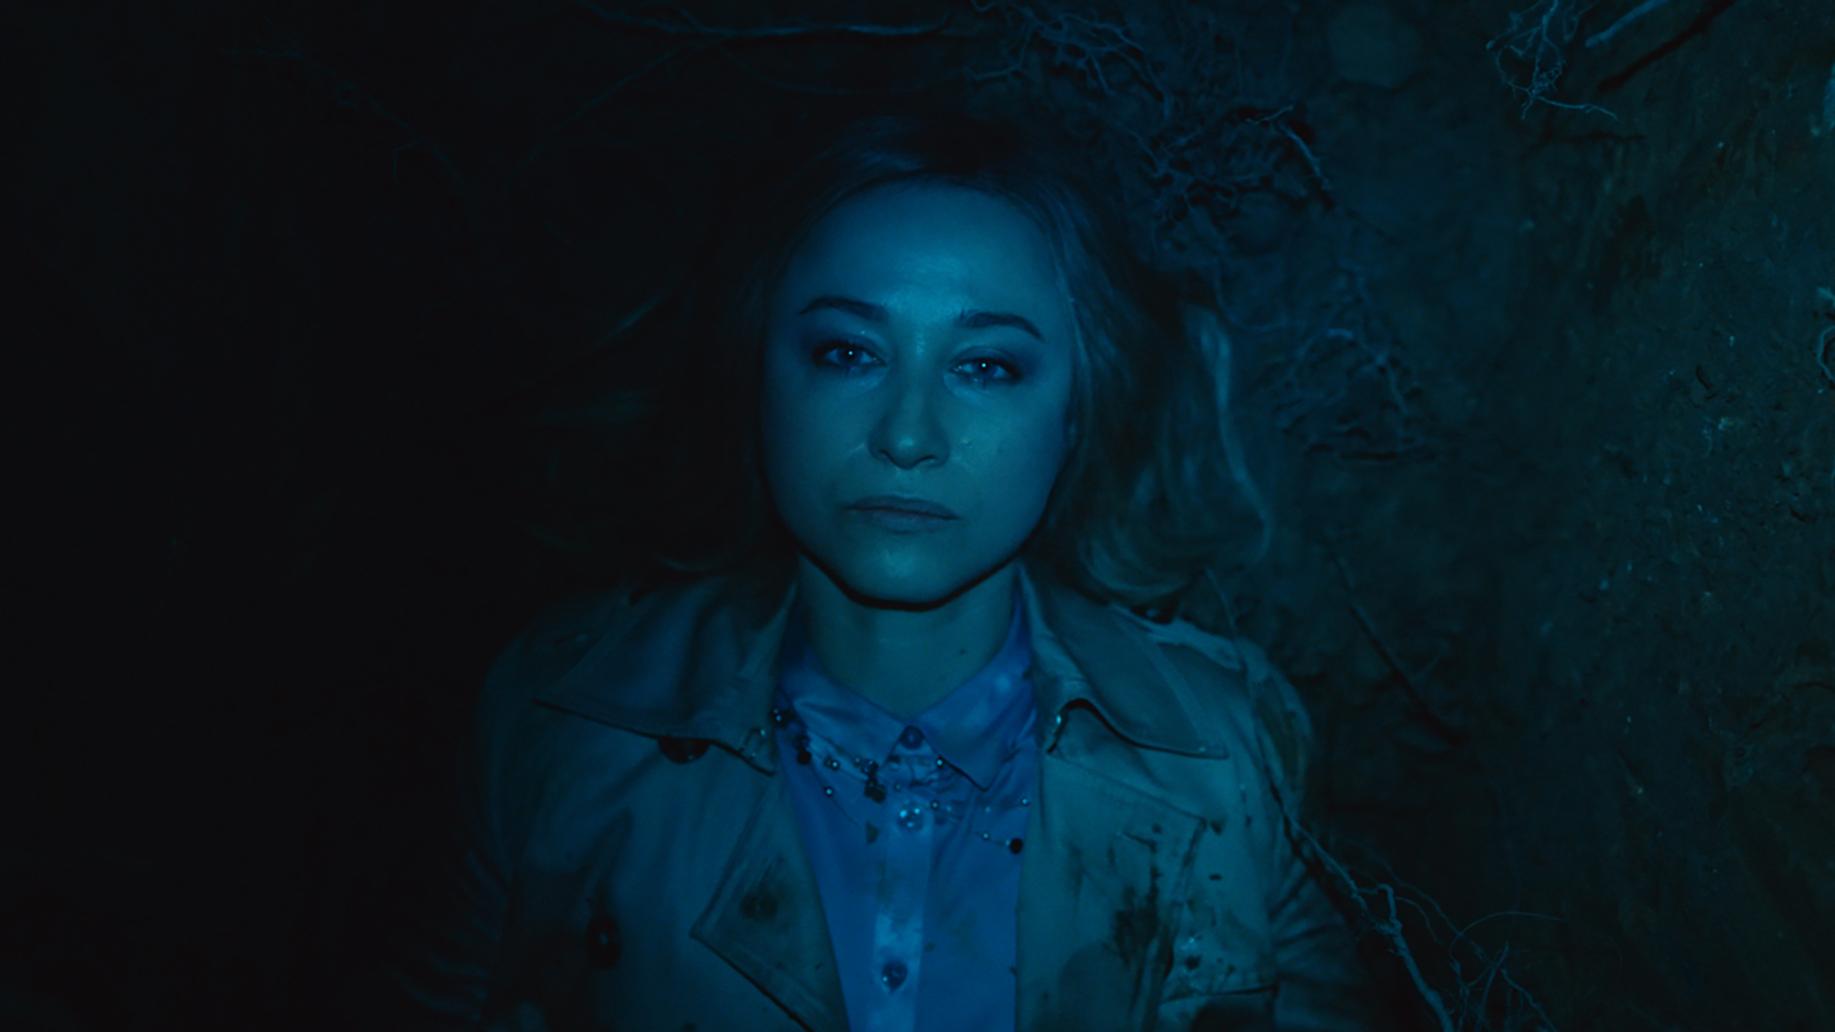 Fuga di Agnieszka Smoczyńska: la recensione da Cannes 2018